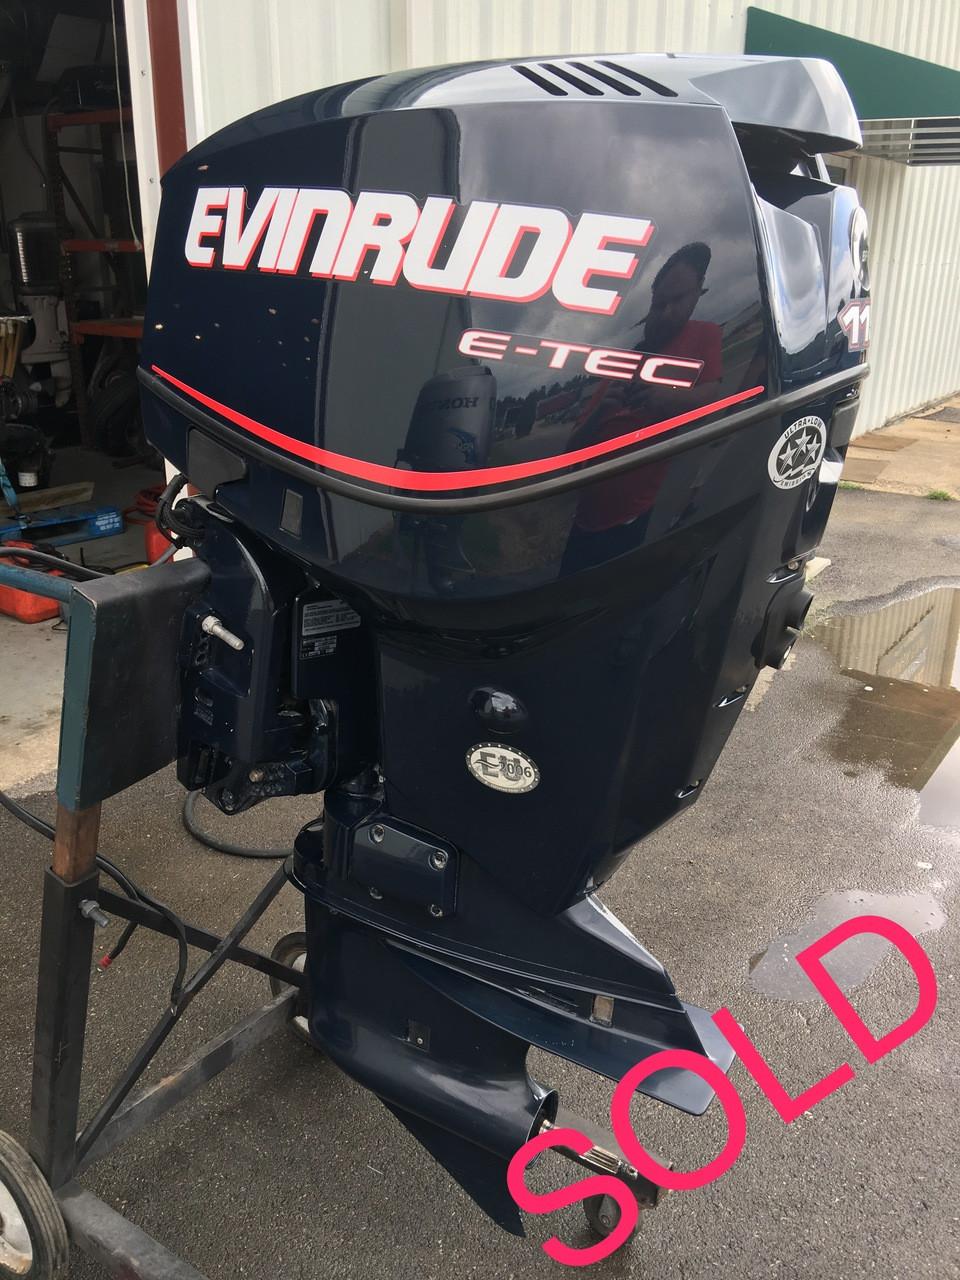 2007 Evinrude 115 HP ETec V4 2-Stroke 20